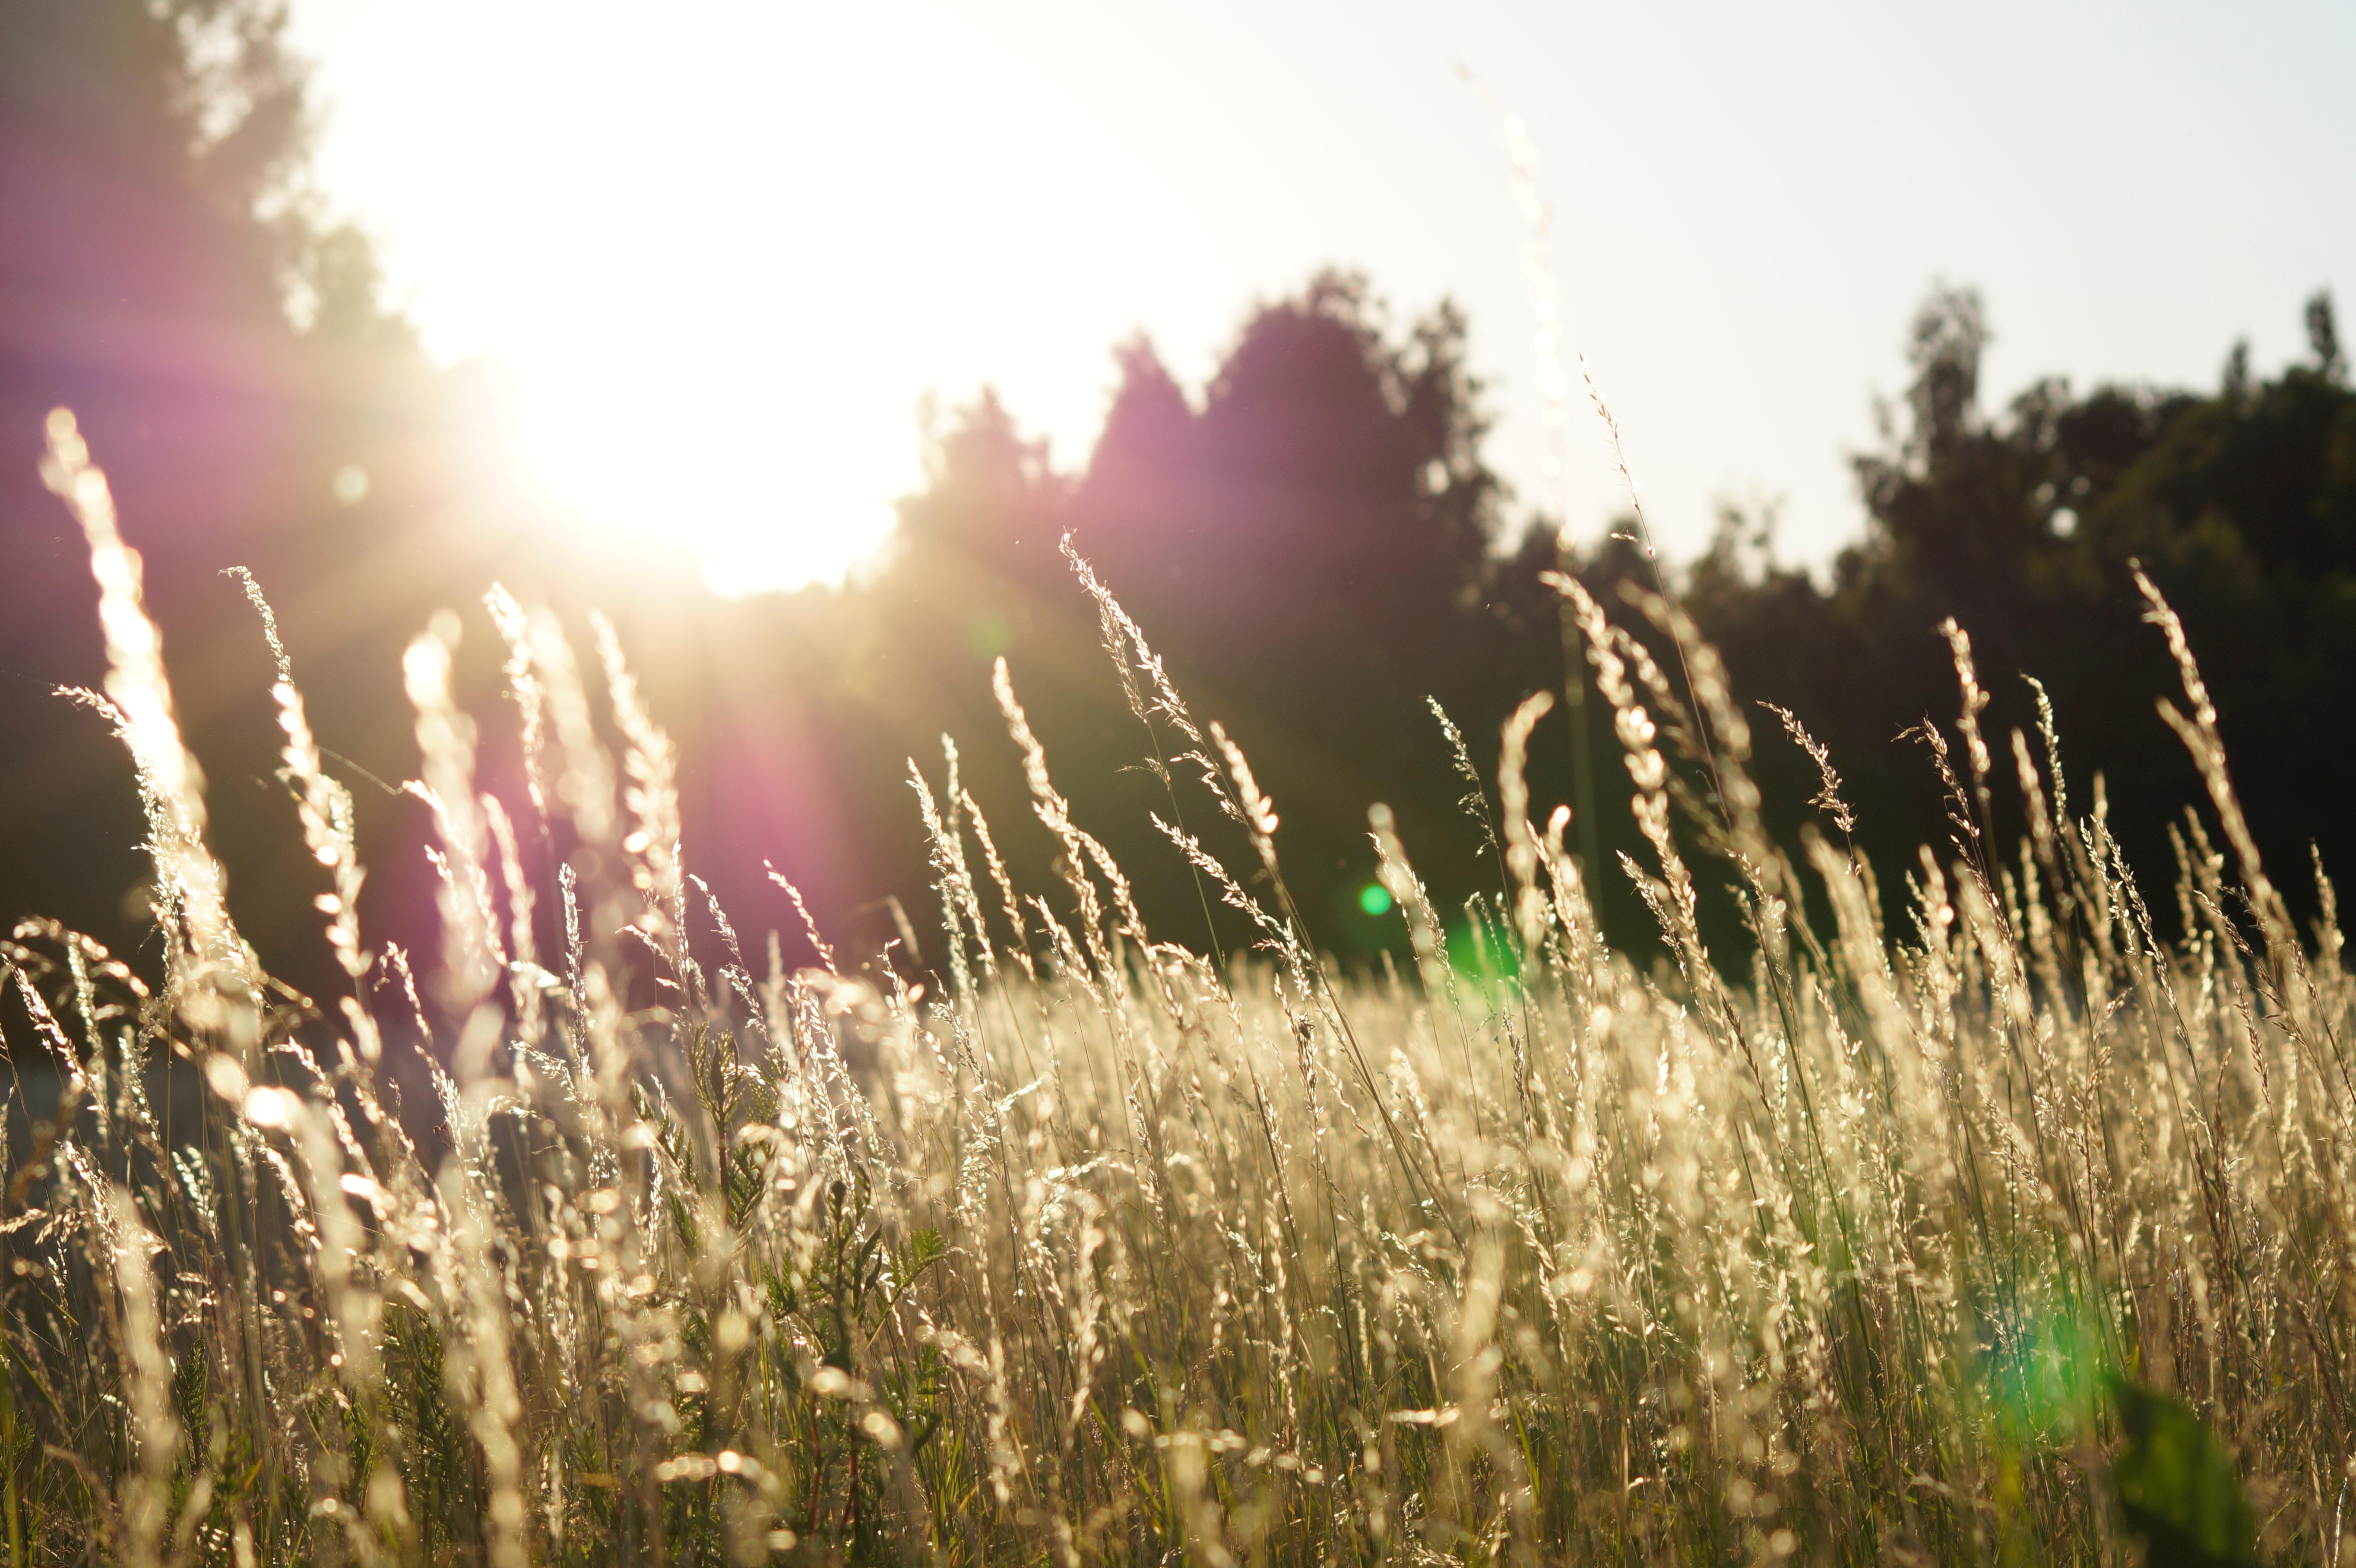 Sonne, Feld, Natur, Sun, Field, Nature, Zon, Veld, Veld, Natuur